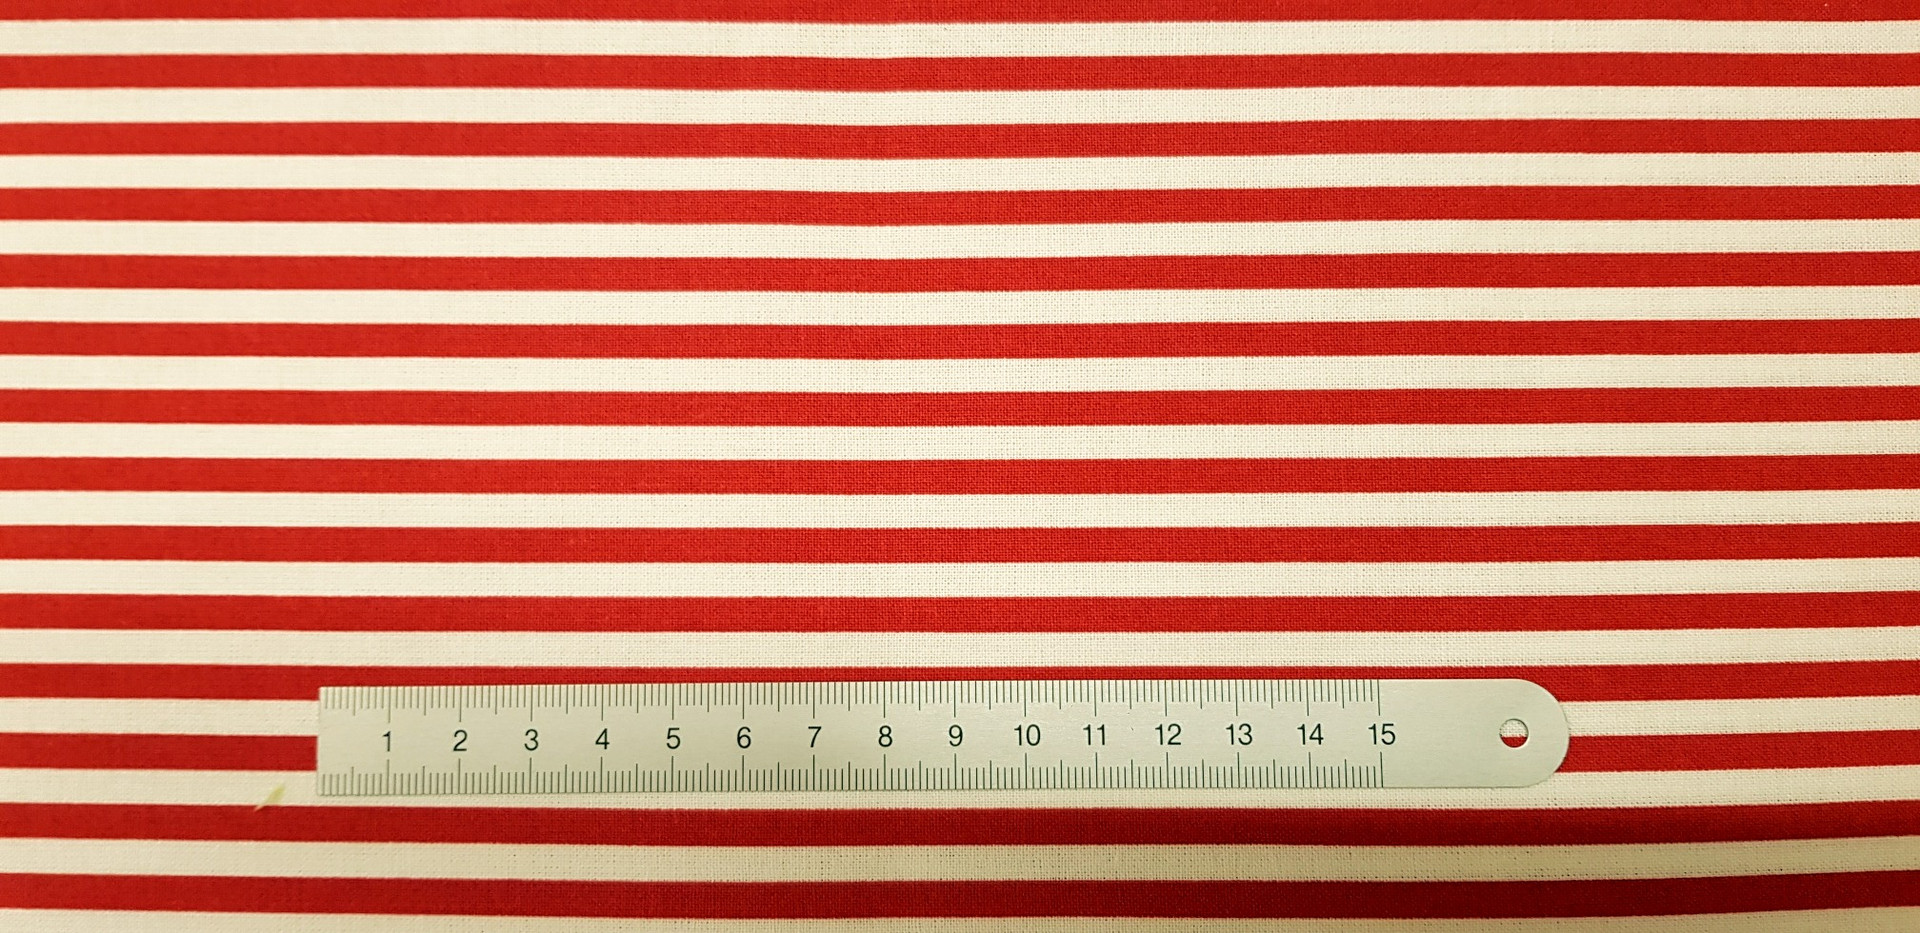 120. White Stripes